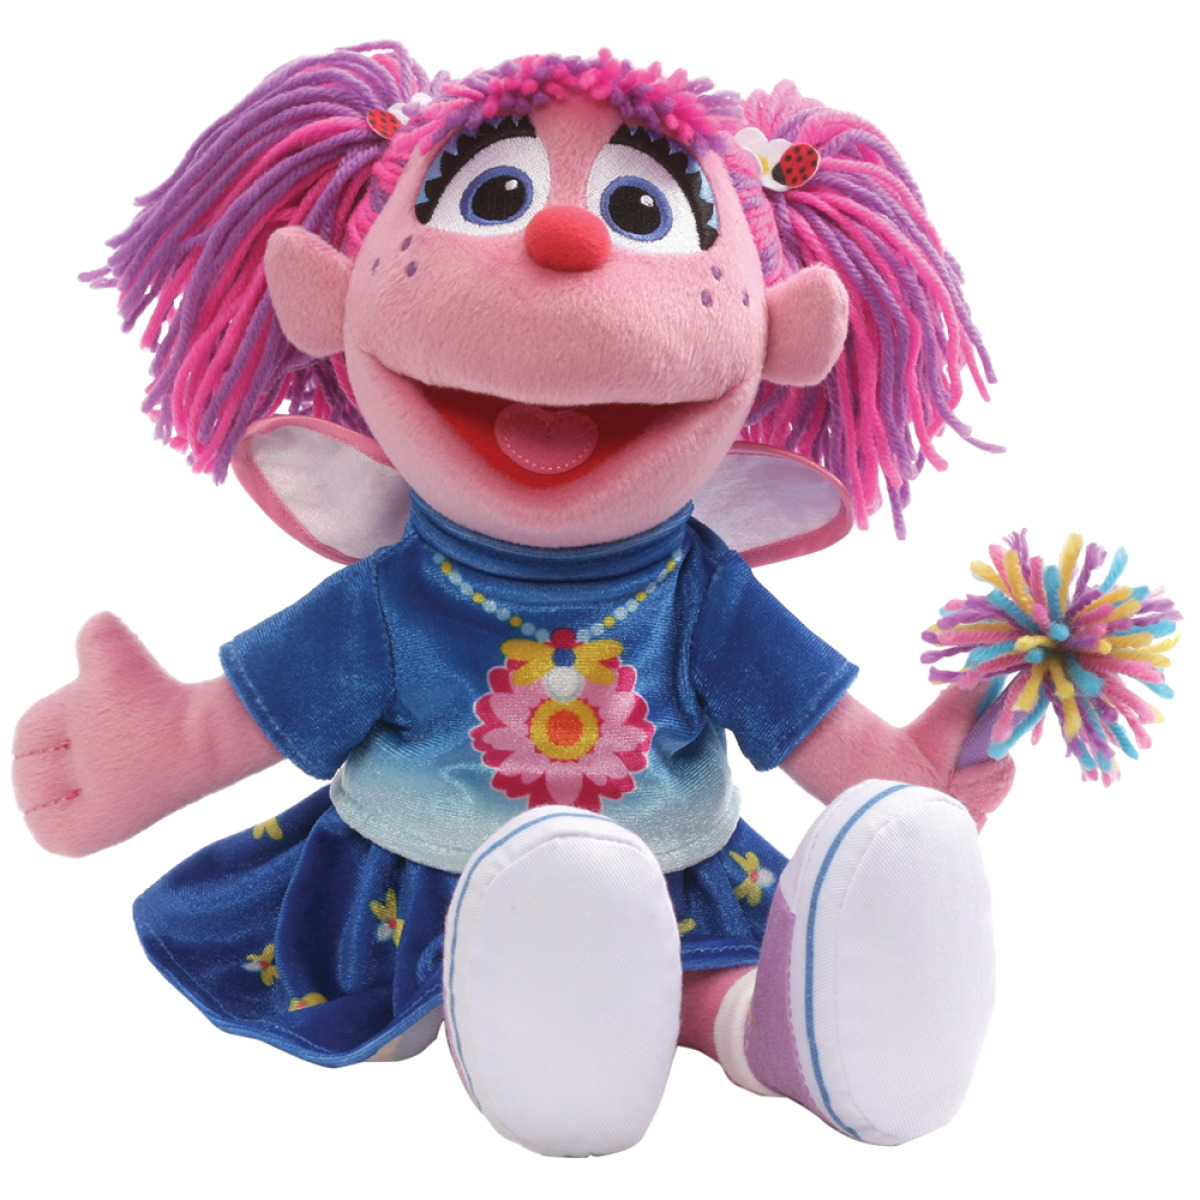 "Sesame Street: Abby Cadabby (New Style) - 11"" Plush image"